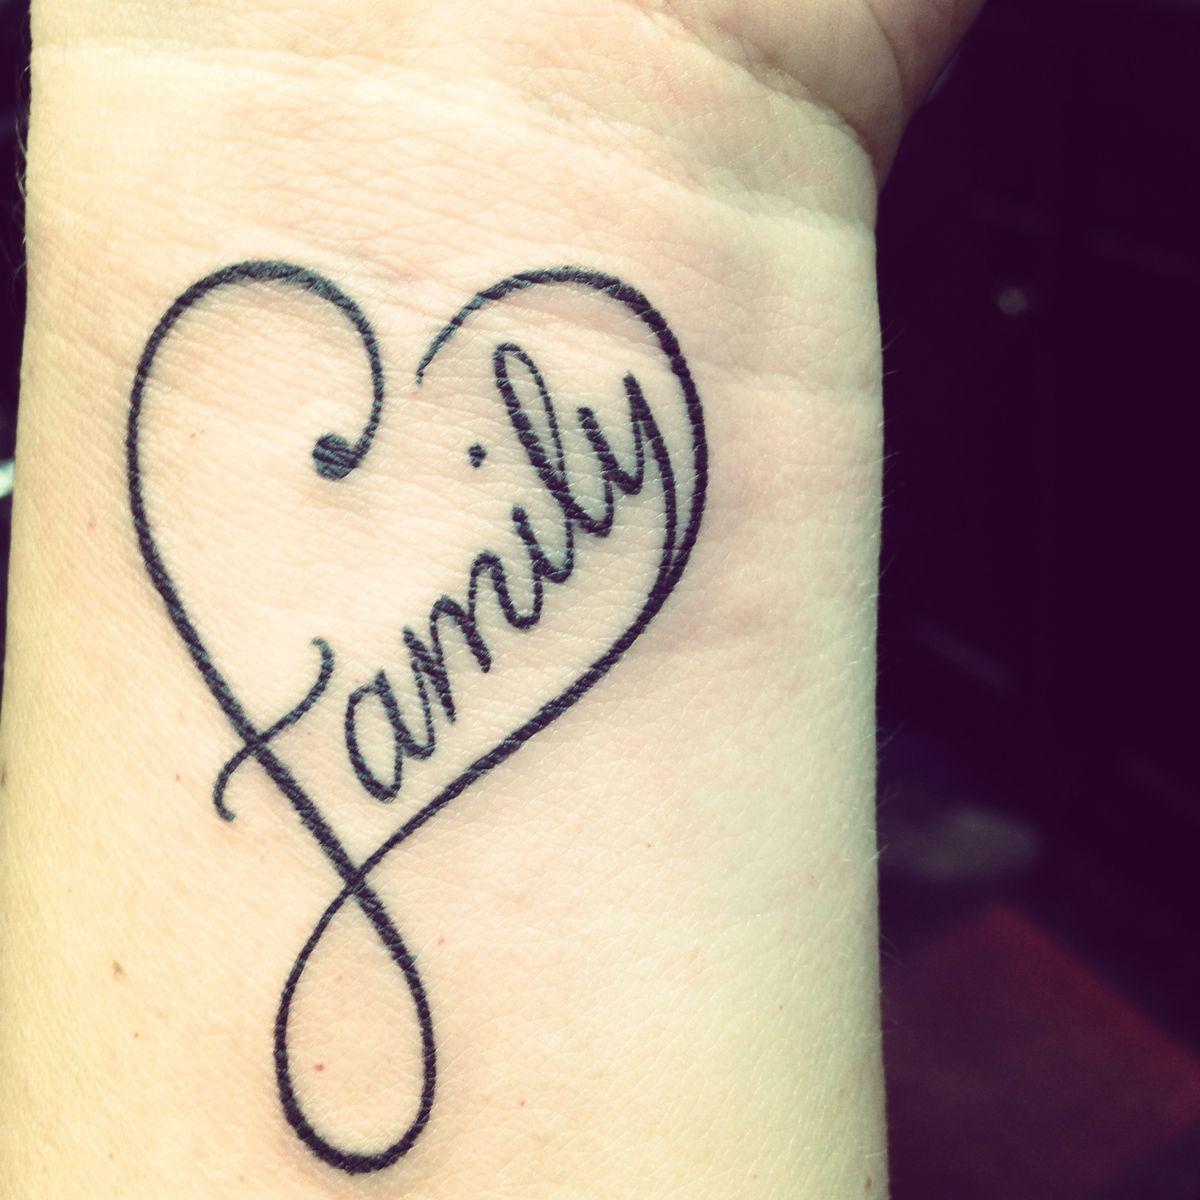 Family Tatoo Pinterest Tatuajes Familias y Tatuajes de familia